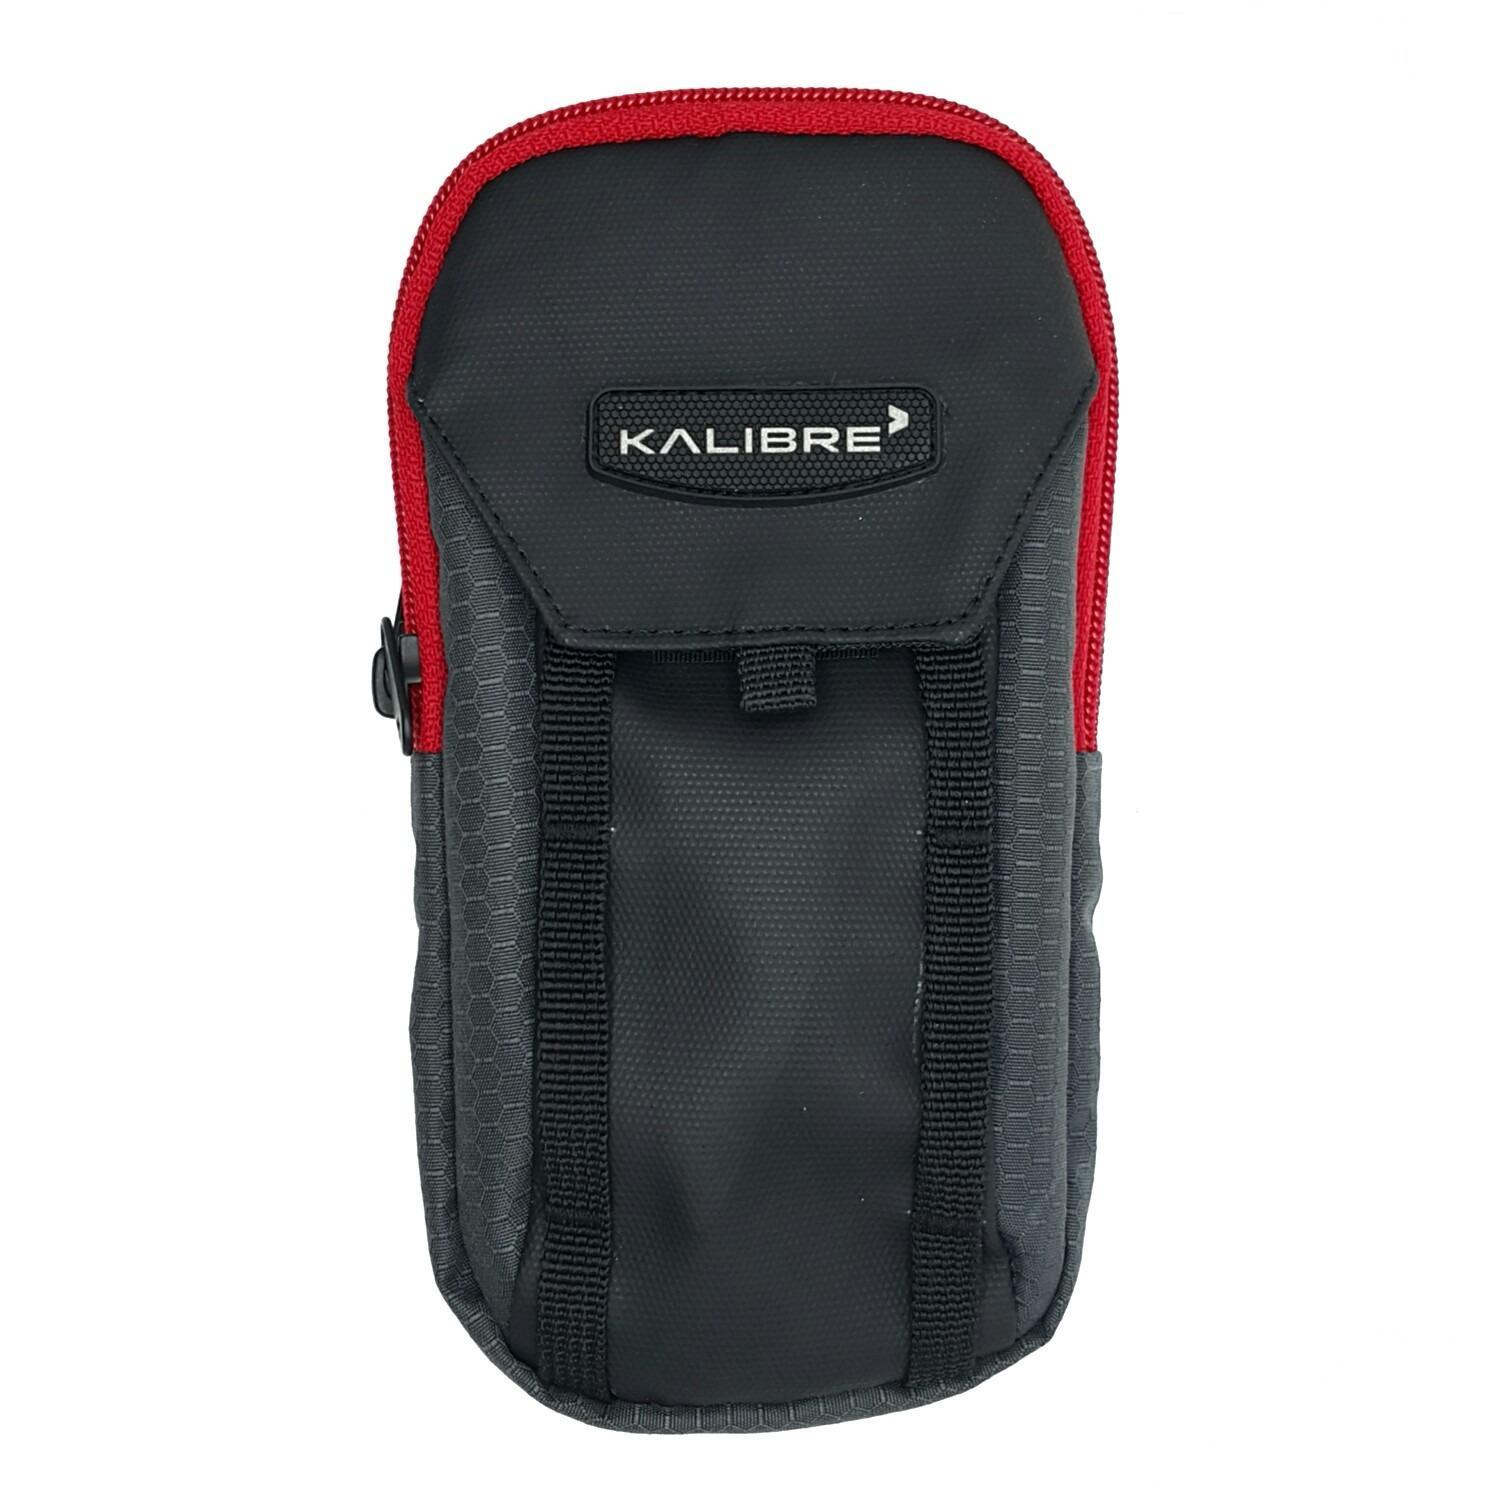 Kalibre 920348-042 Smartphone Case / Dompet Hp / Tas pinggang Vape / Vapor / Android / Iphone / Bb / Digital Camera Grey-Black